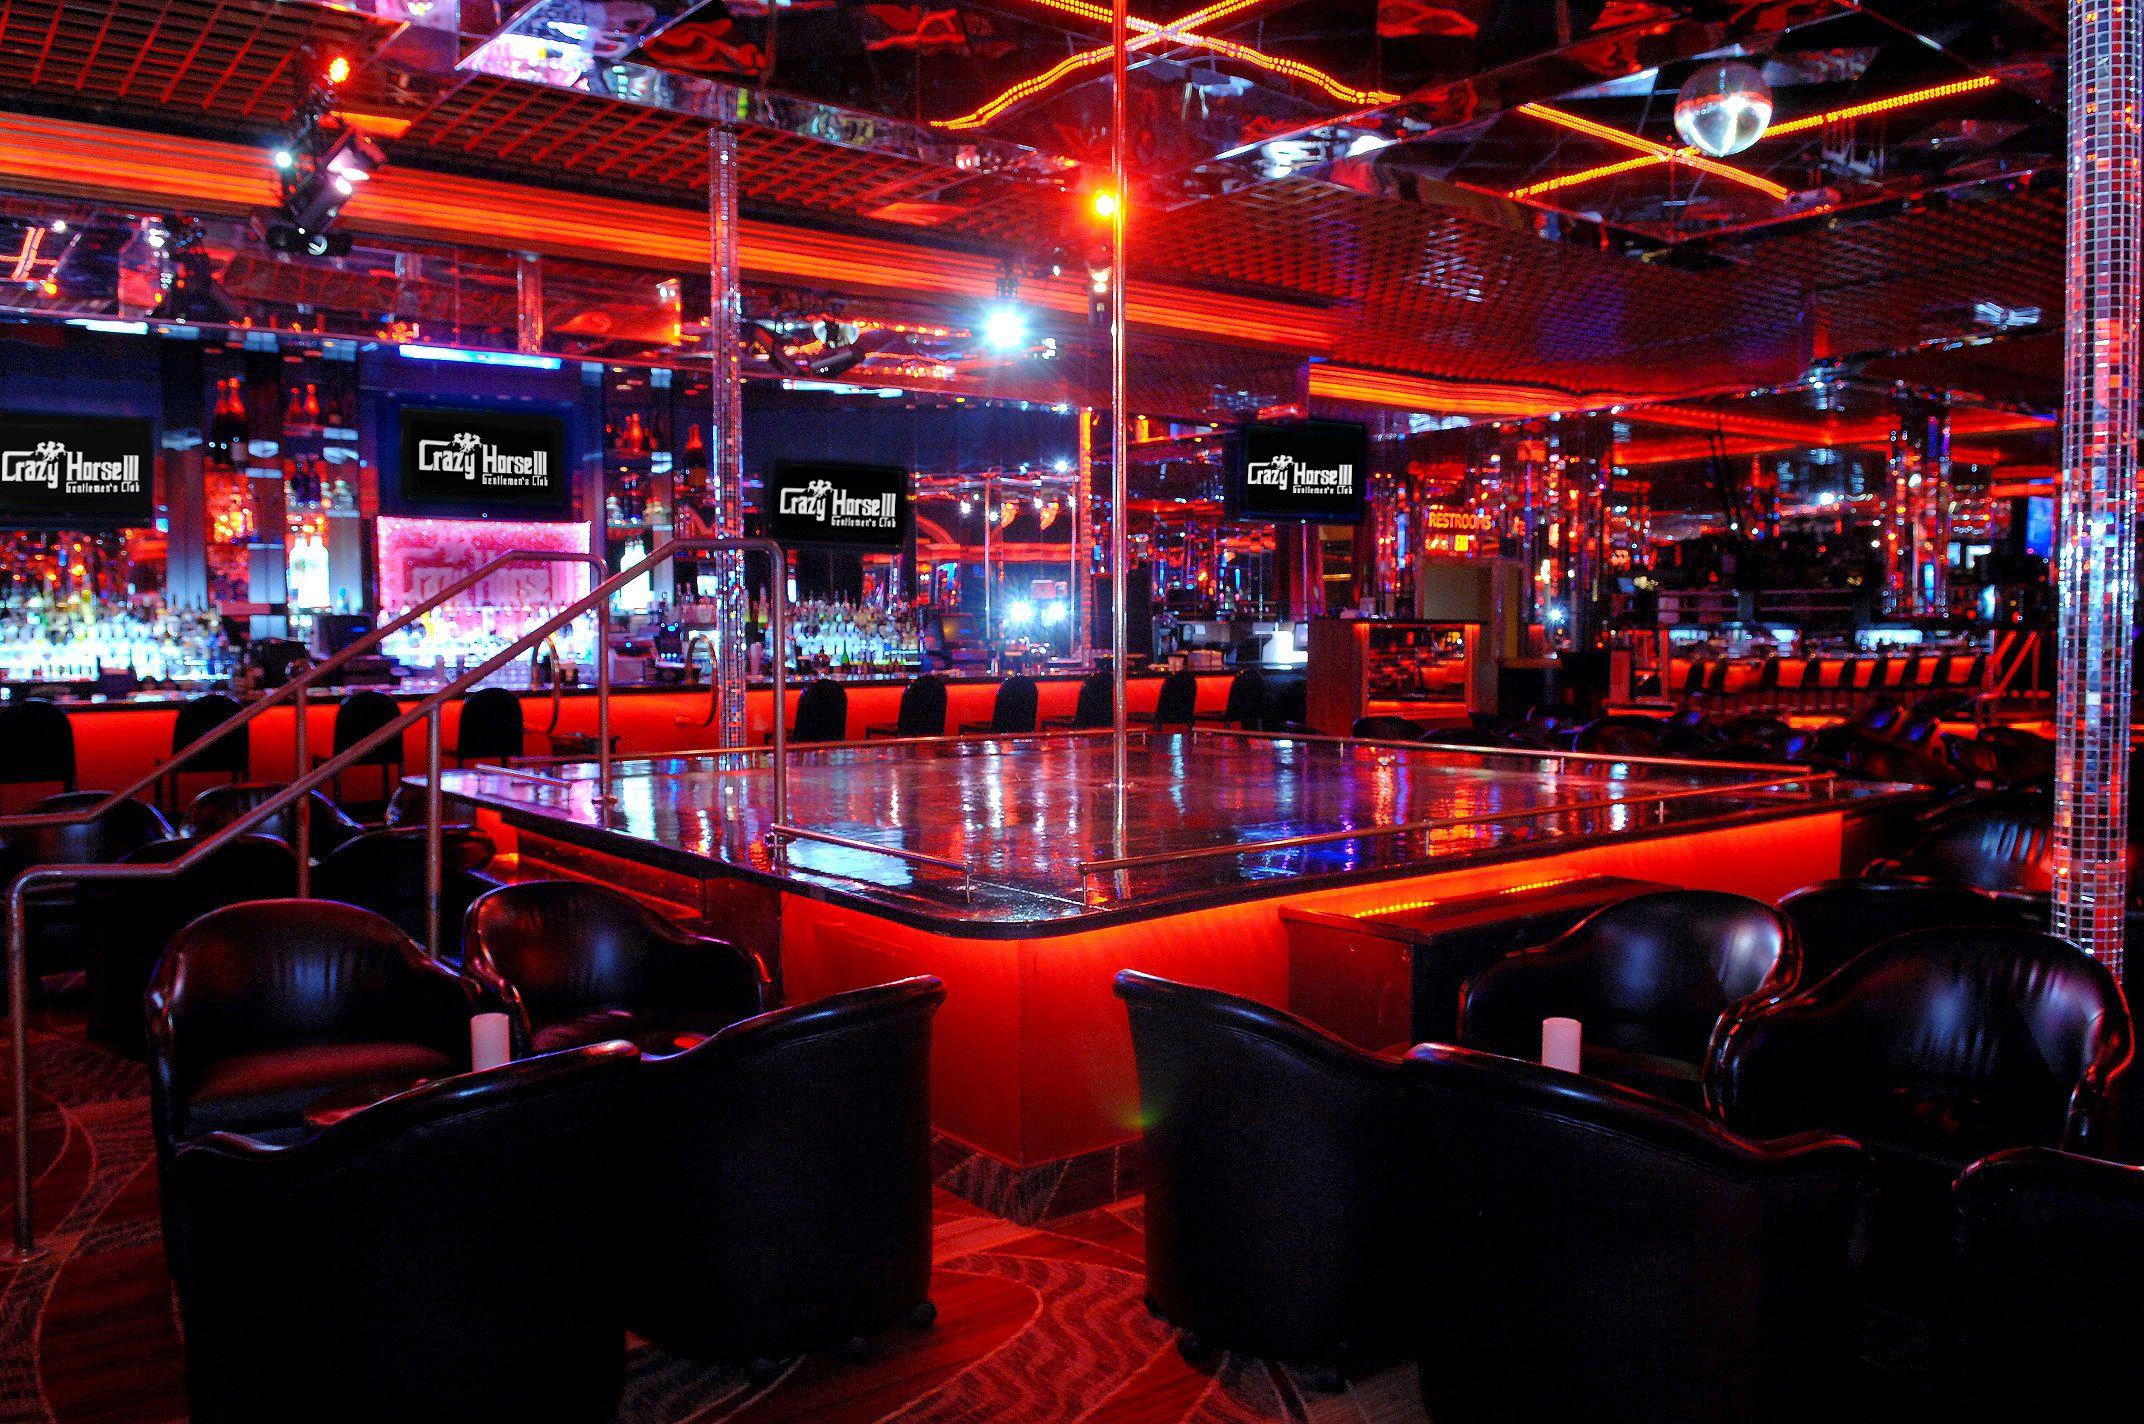 Channel las vegas strip clubs, seduce mature free movies